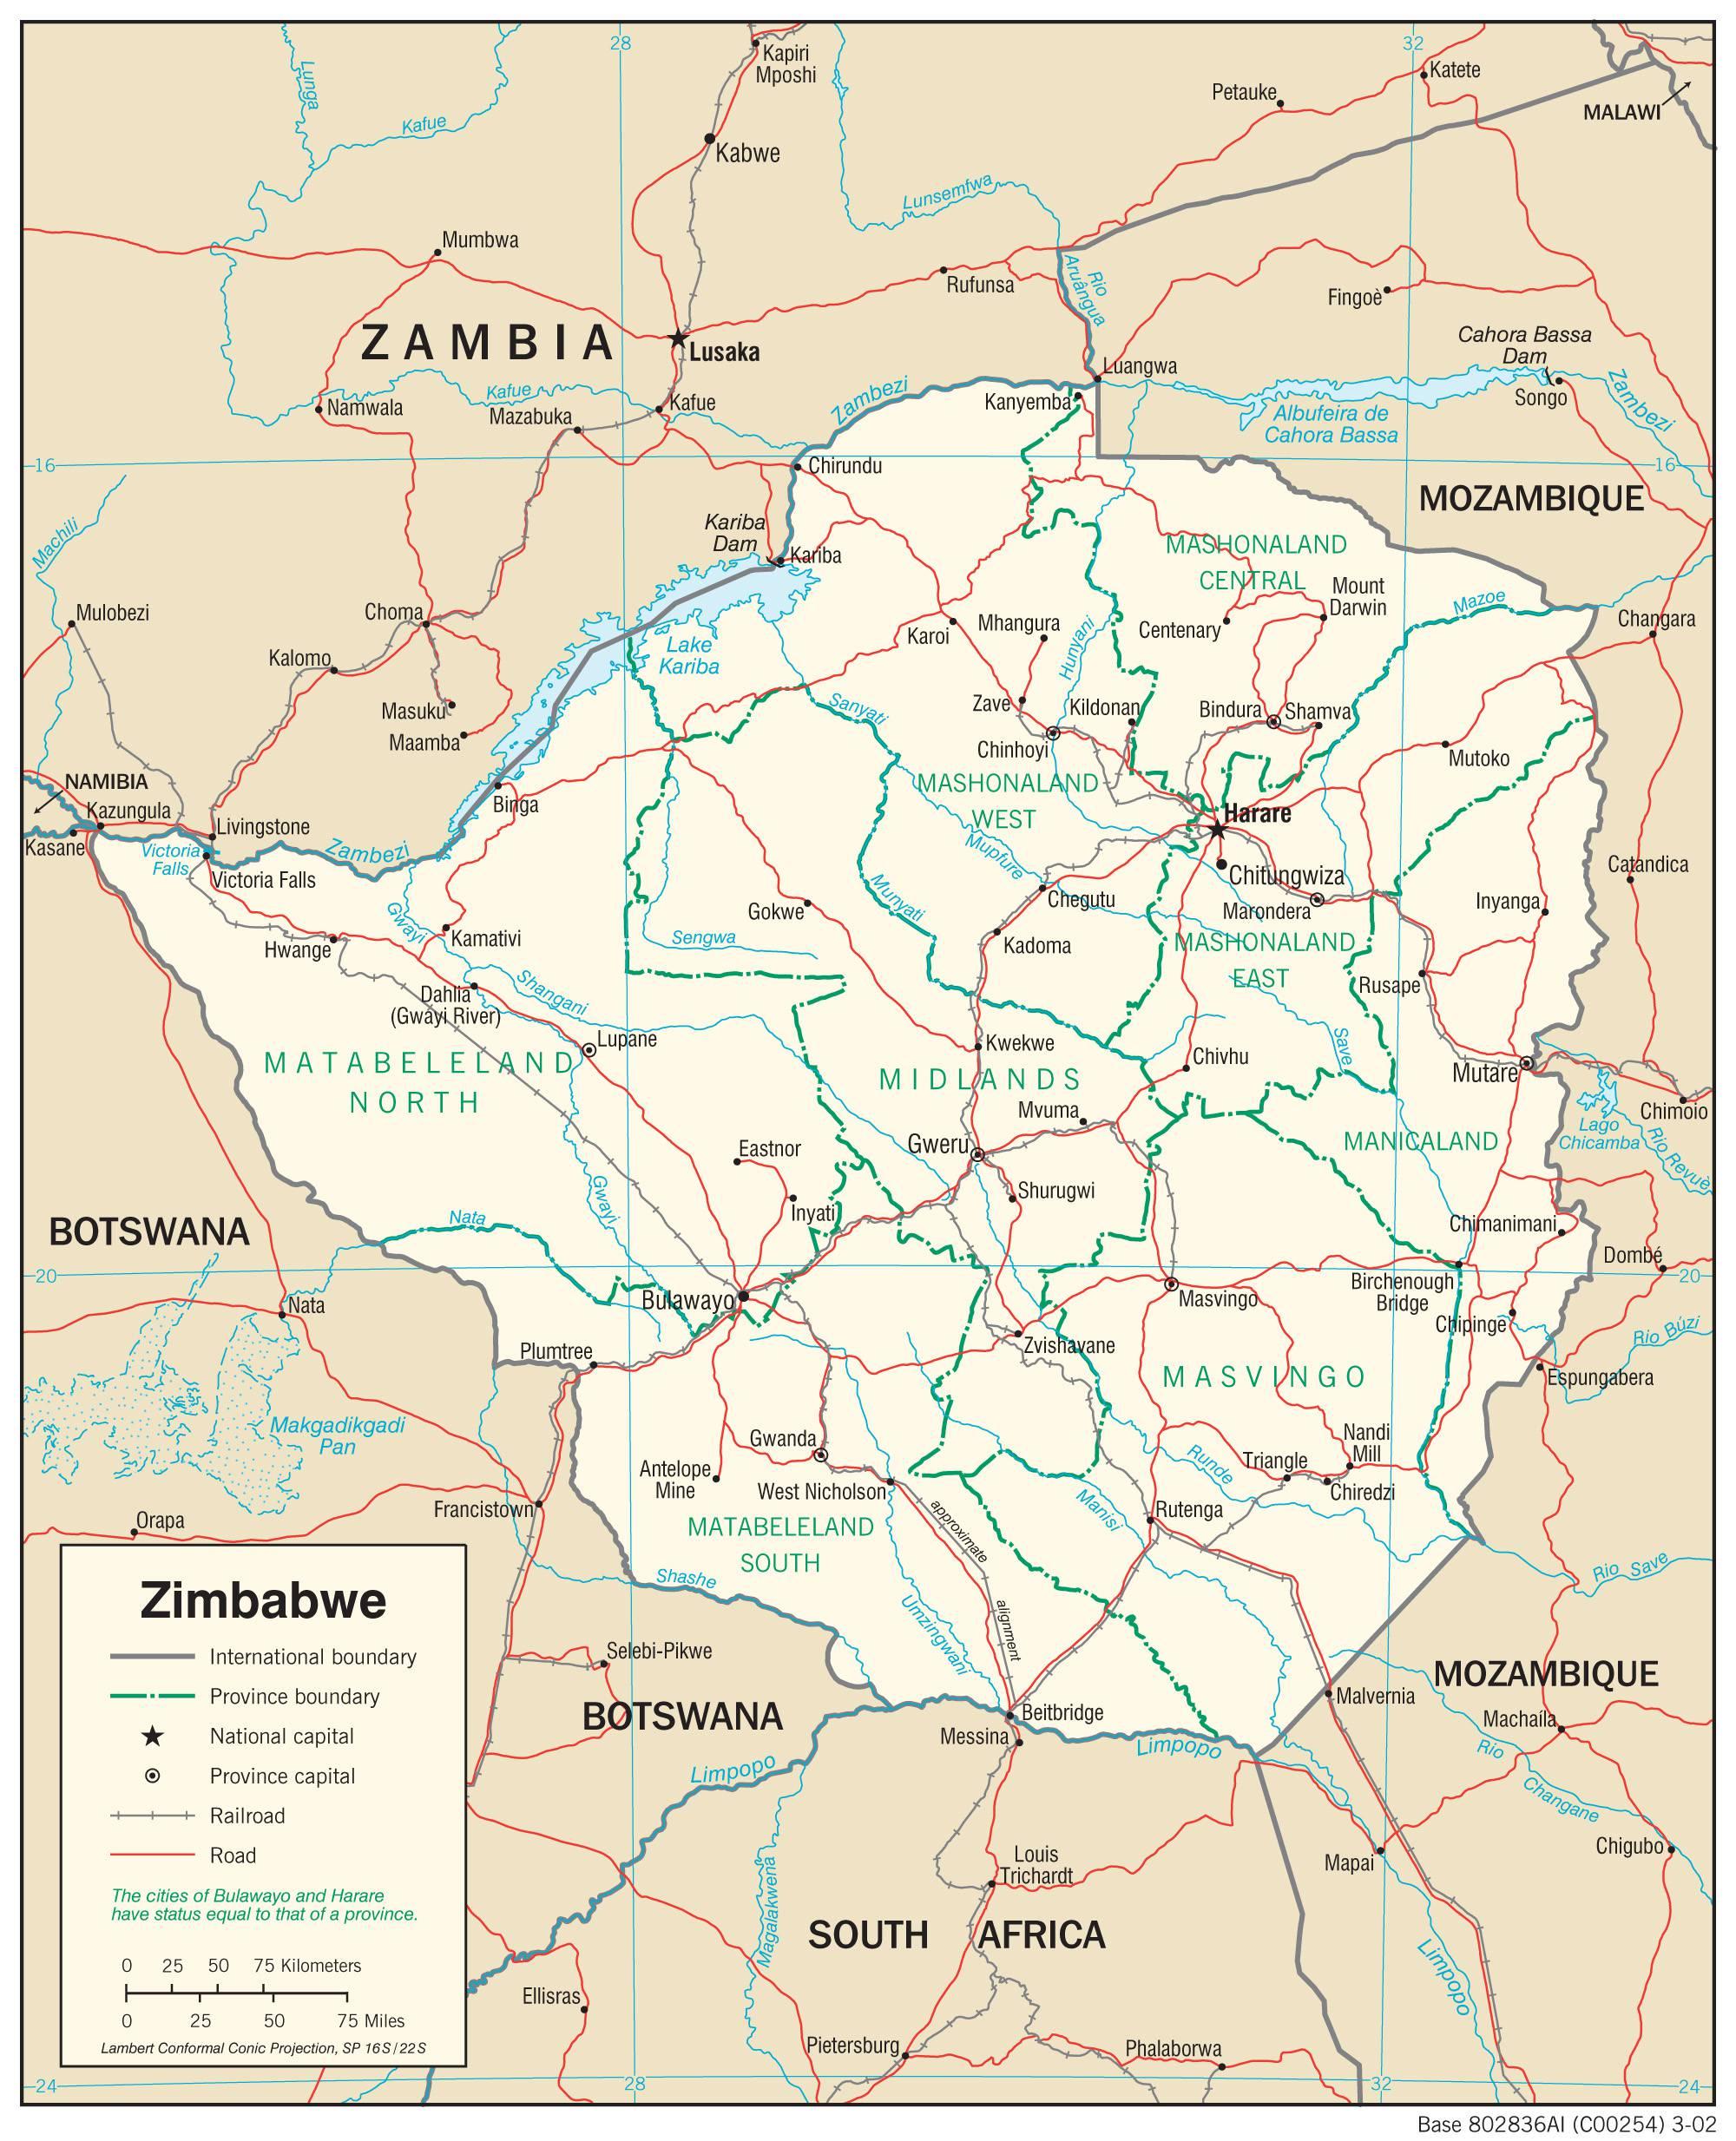 Carte détaillée du Zimbabwe